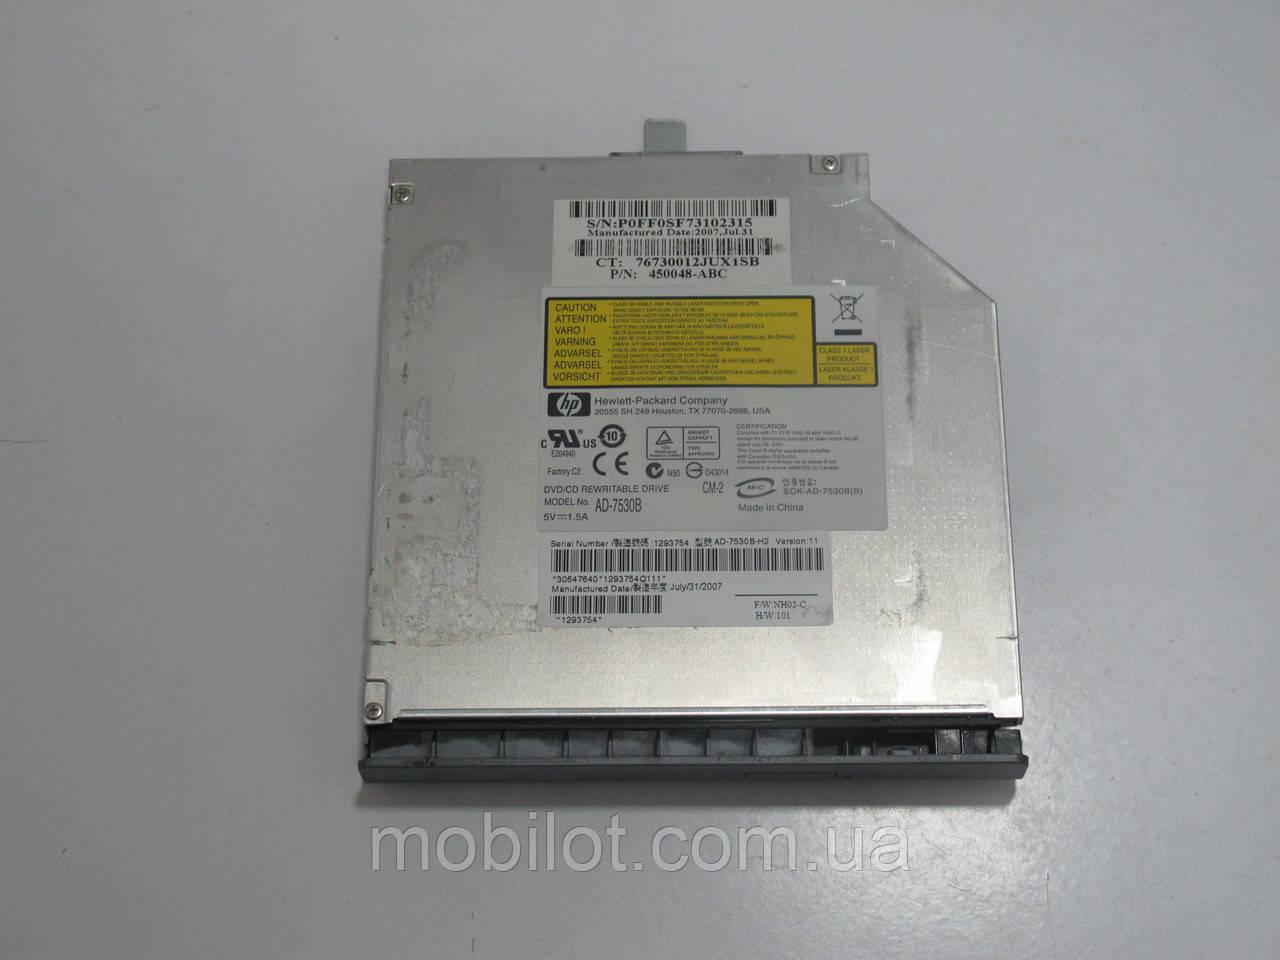 Оптический привод HP 530 (NZ-6599)